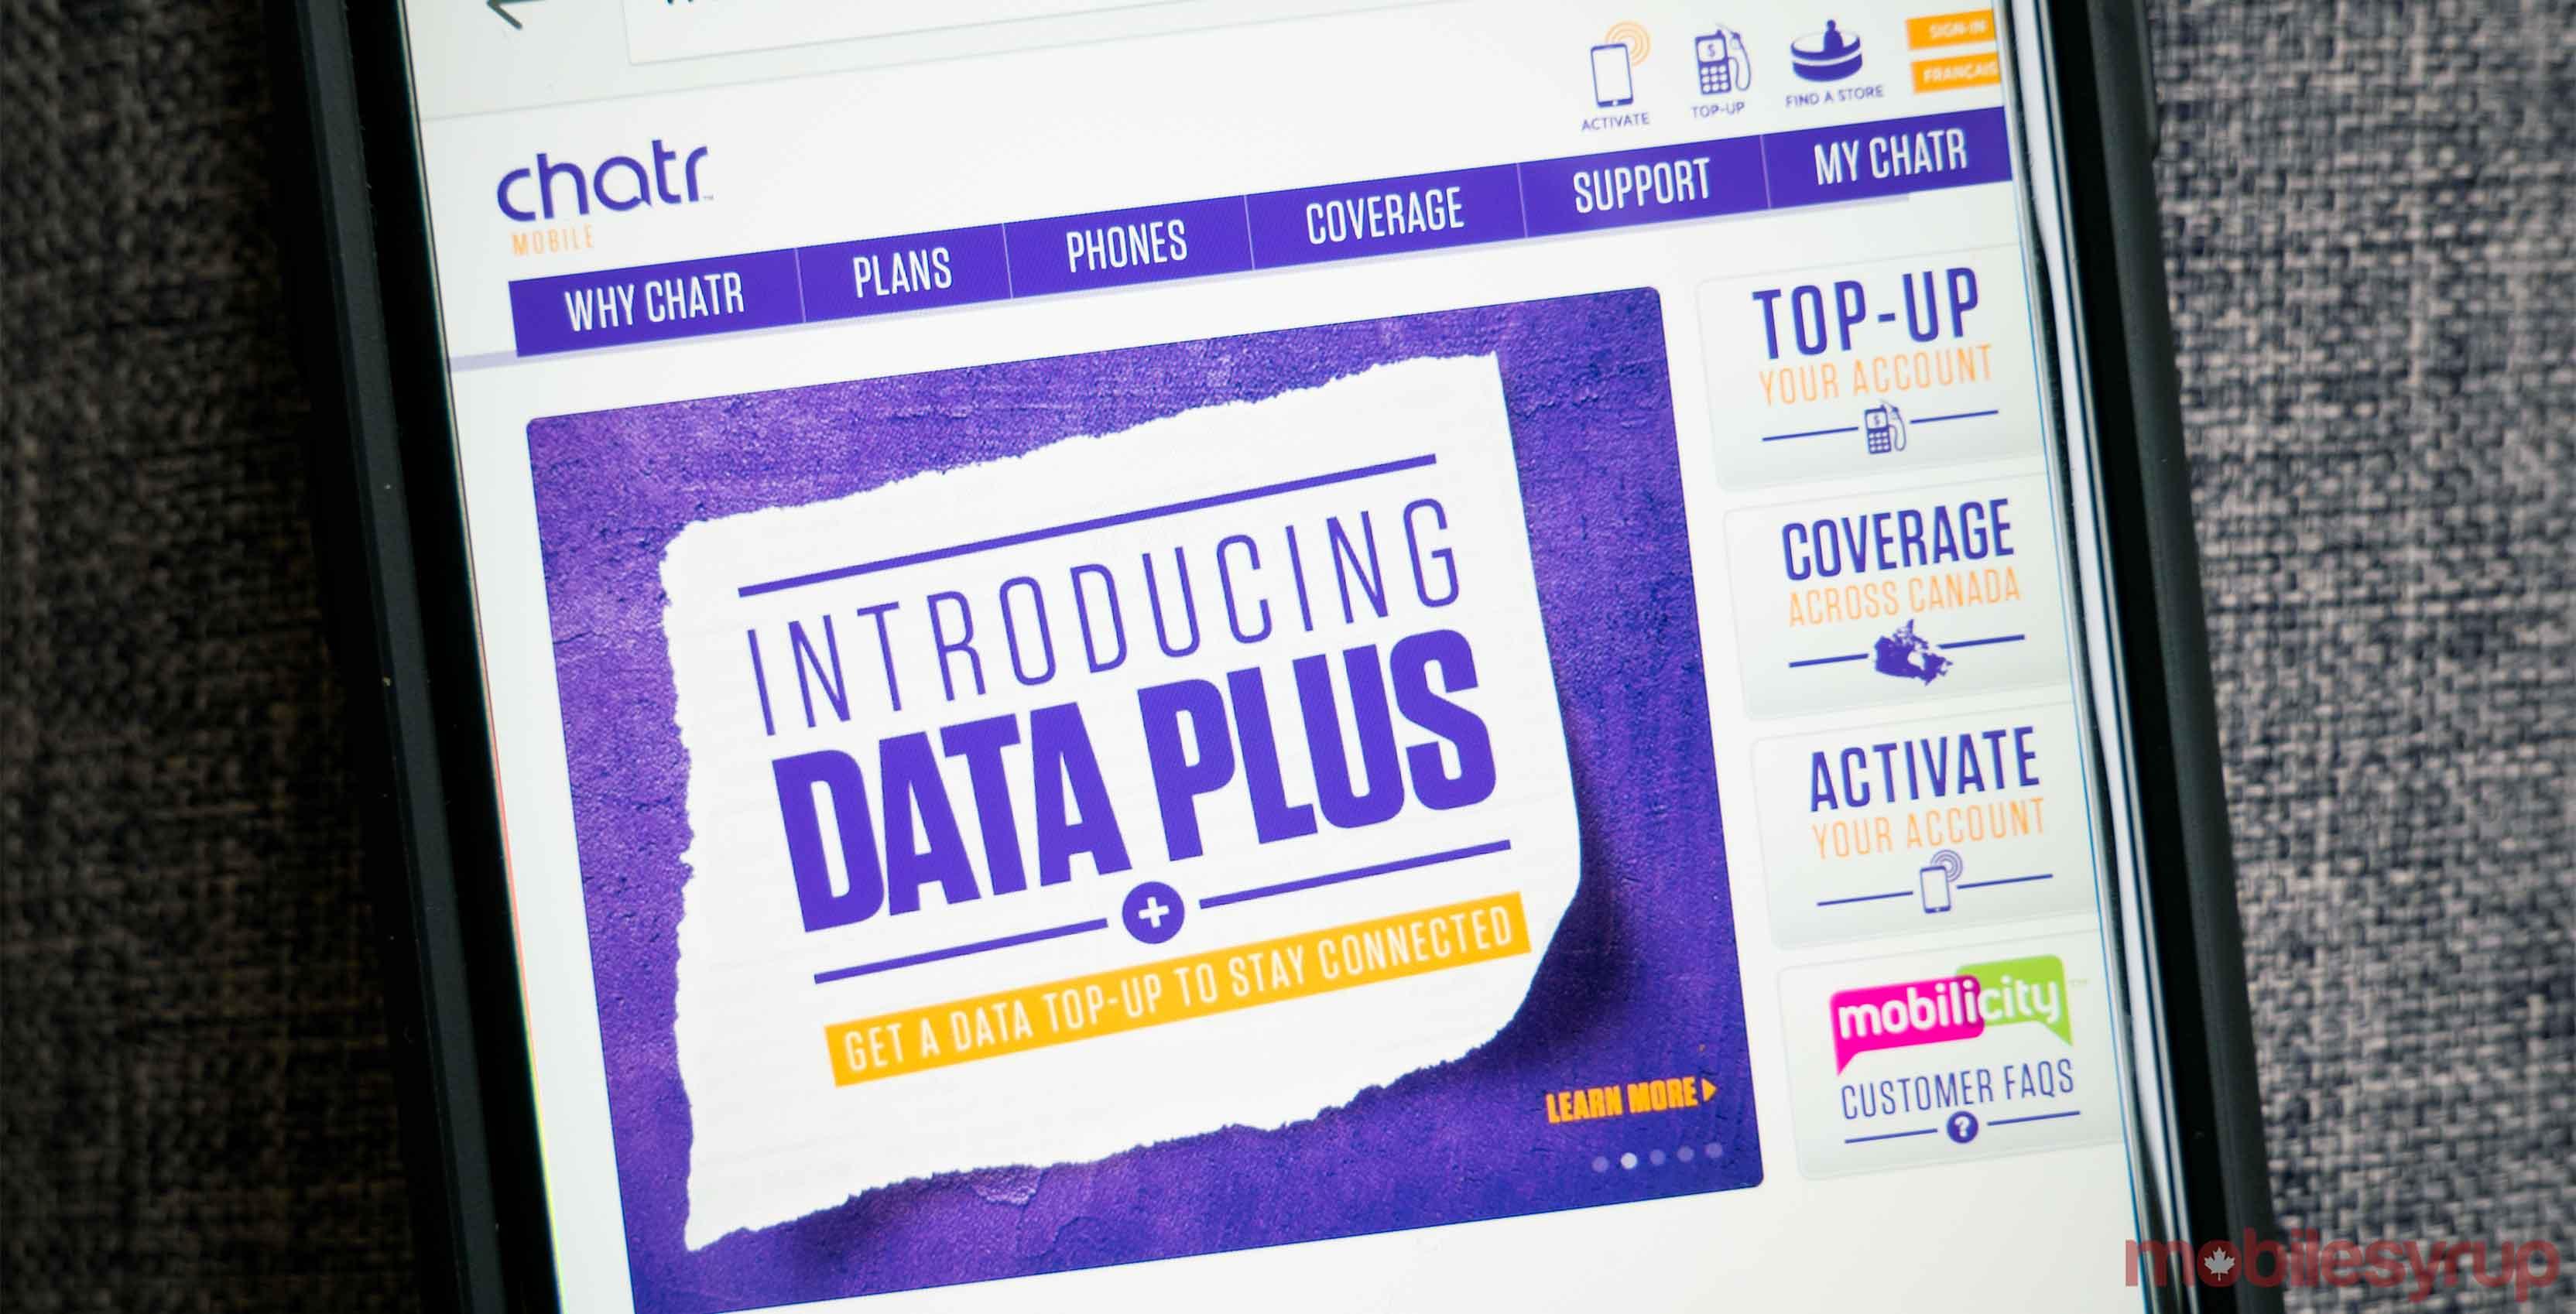 Chatr website chatr bonus data